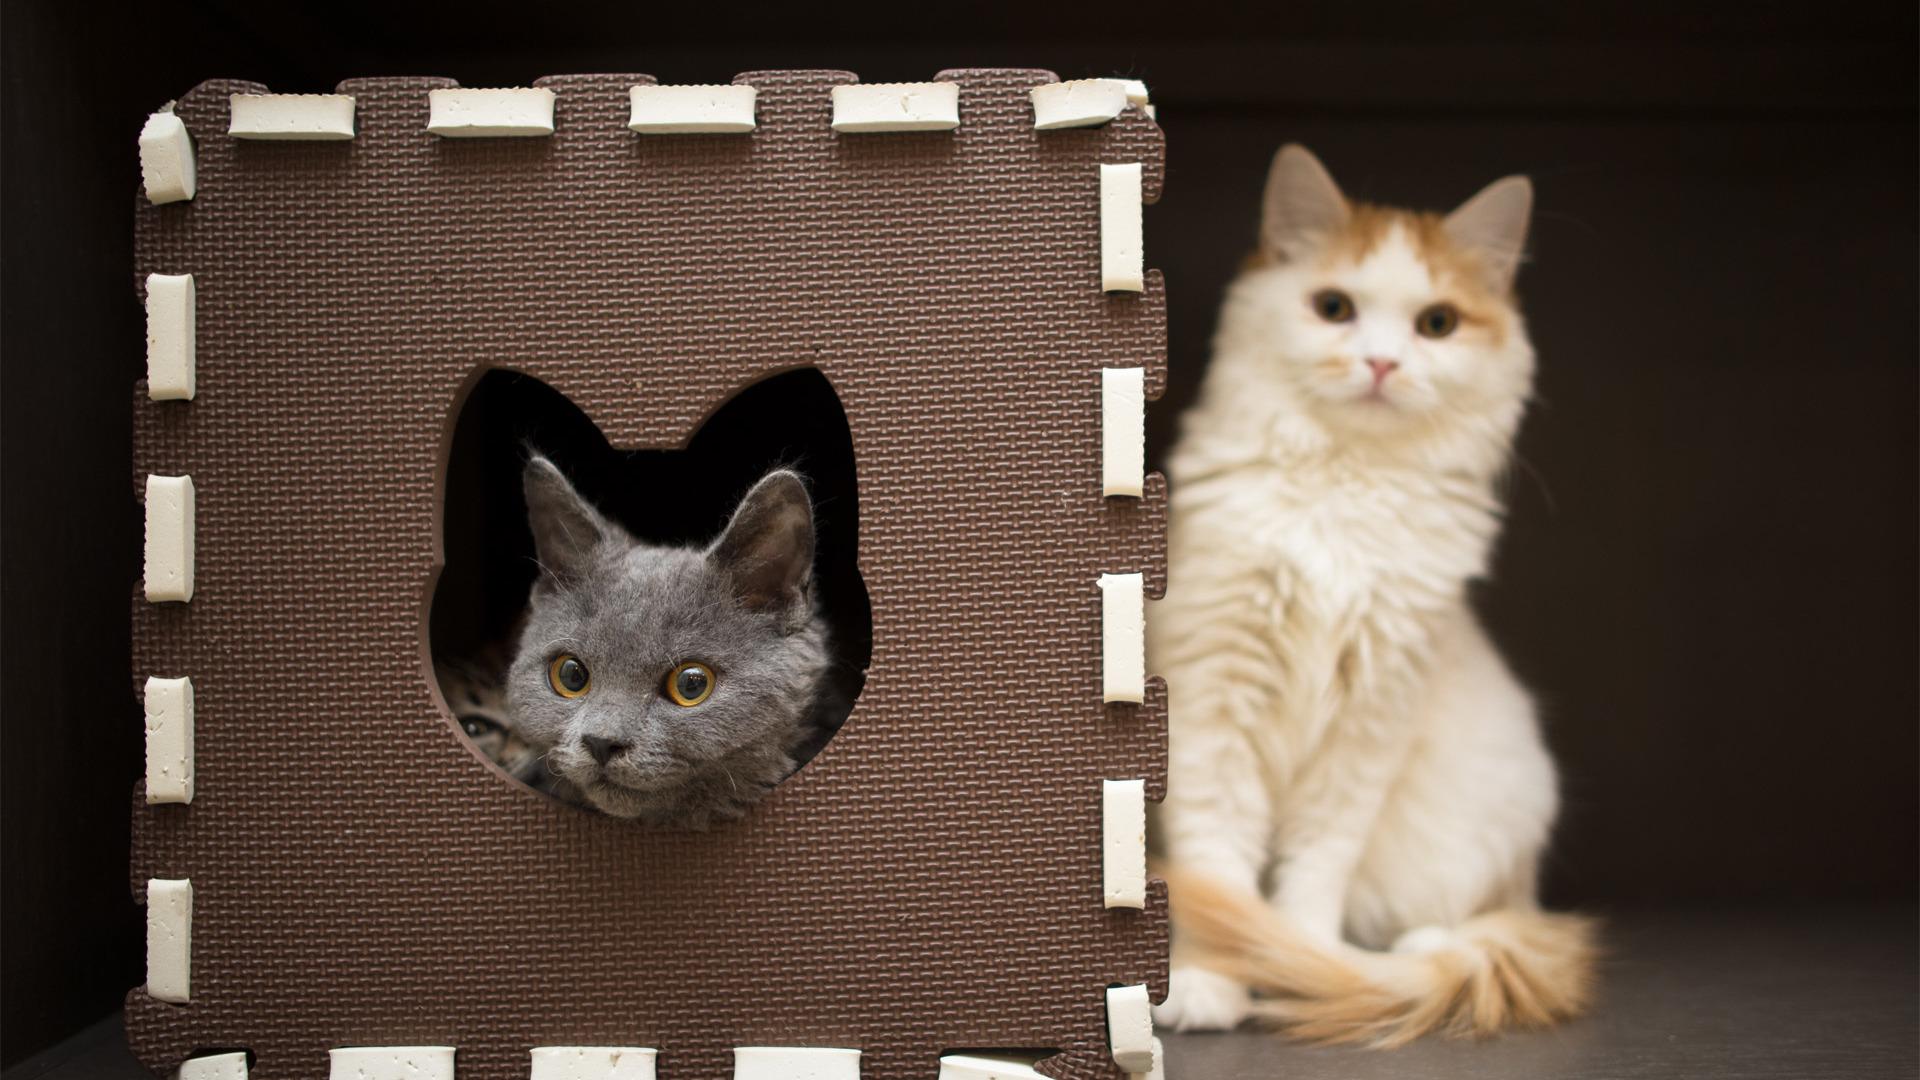 Картинки фокус, домик, морда, размытость, кошки - обои 1600x.